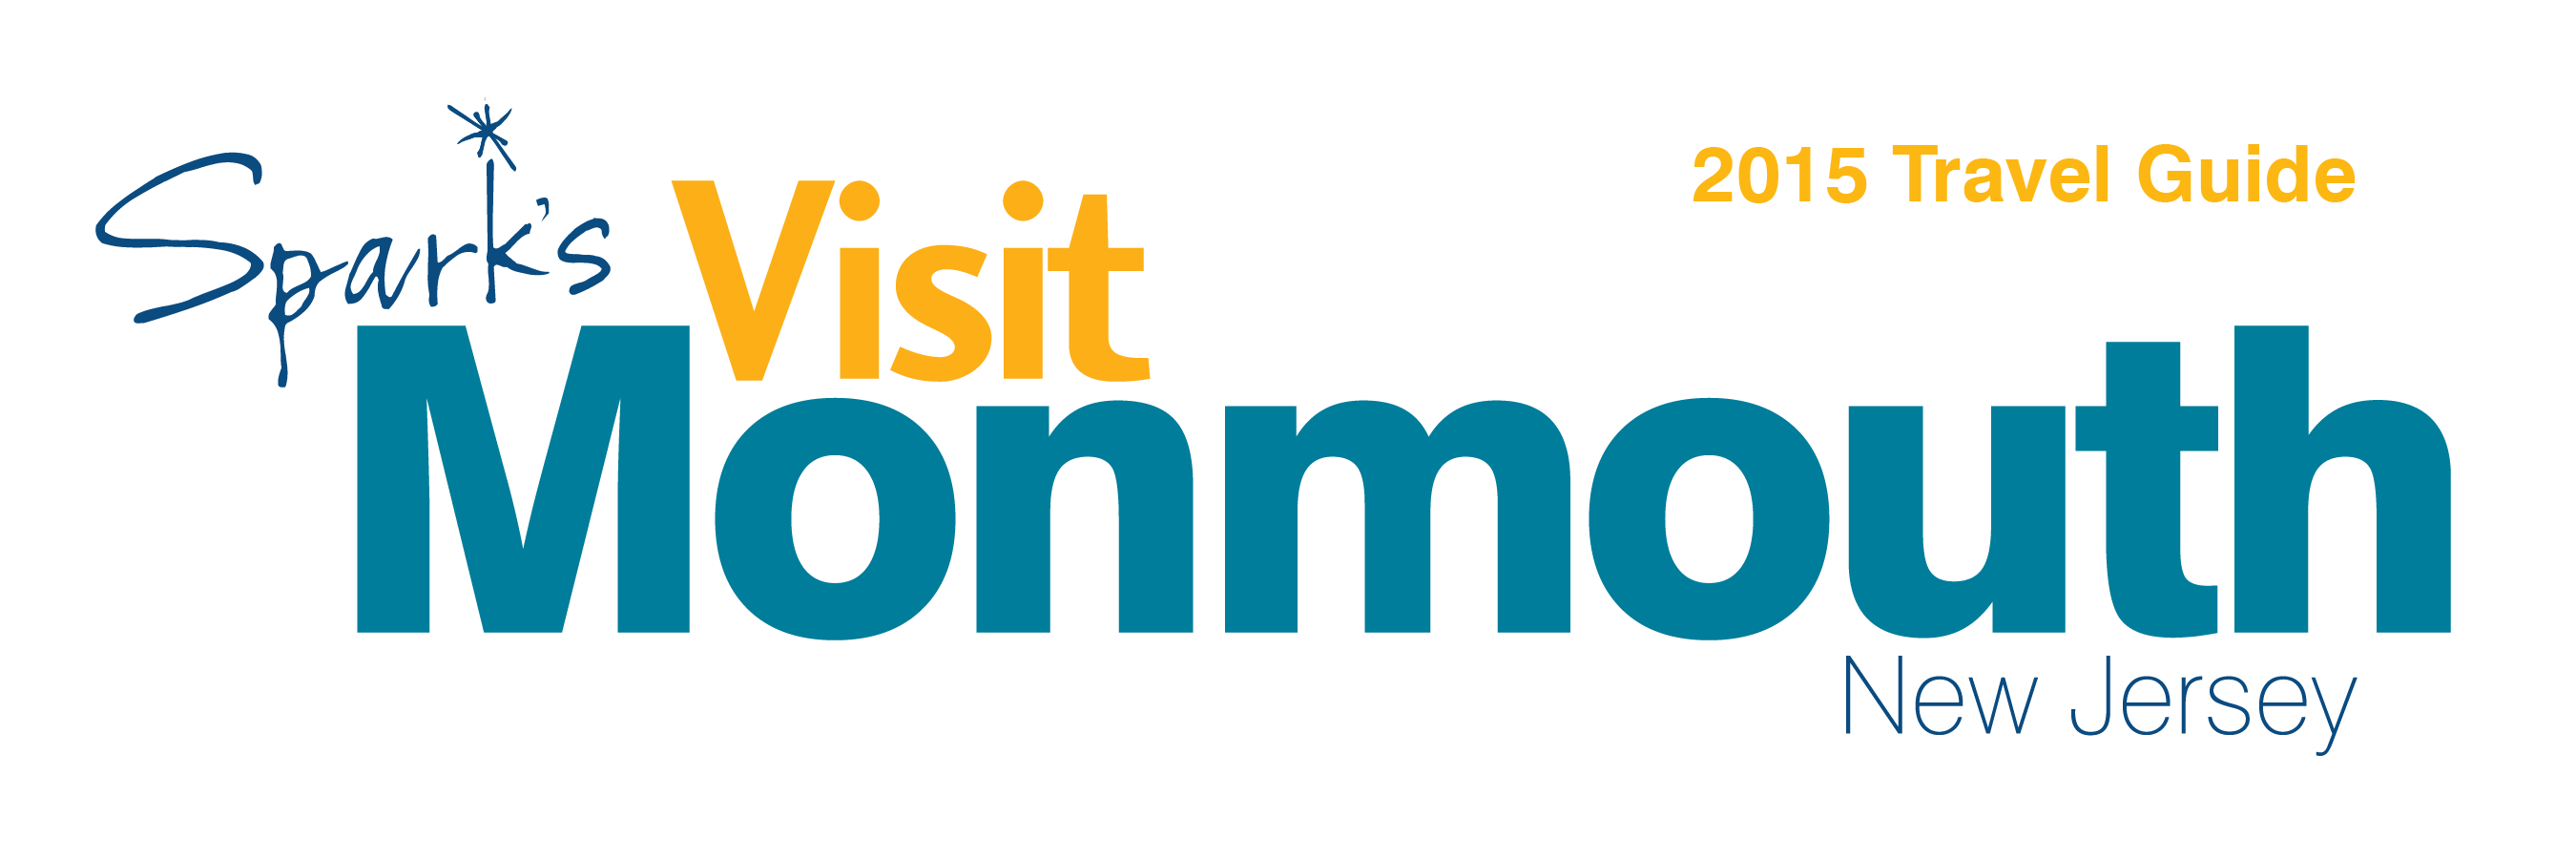 Visit Monmouth 2014